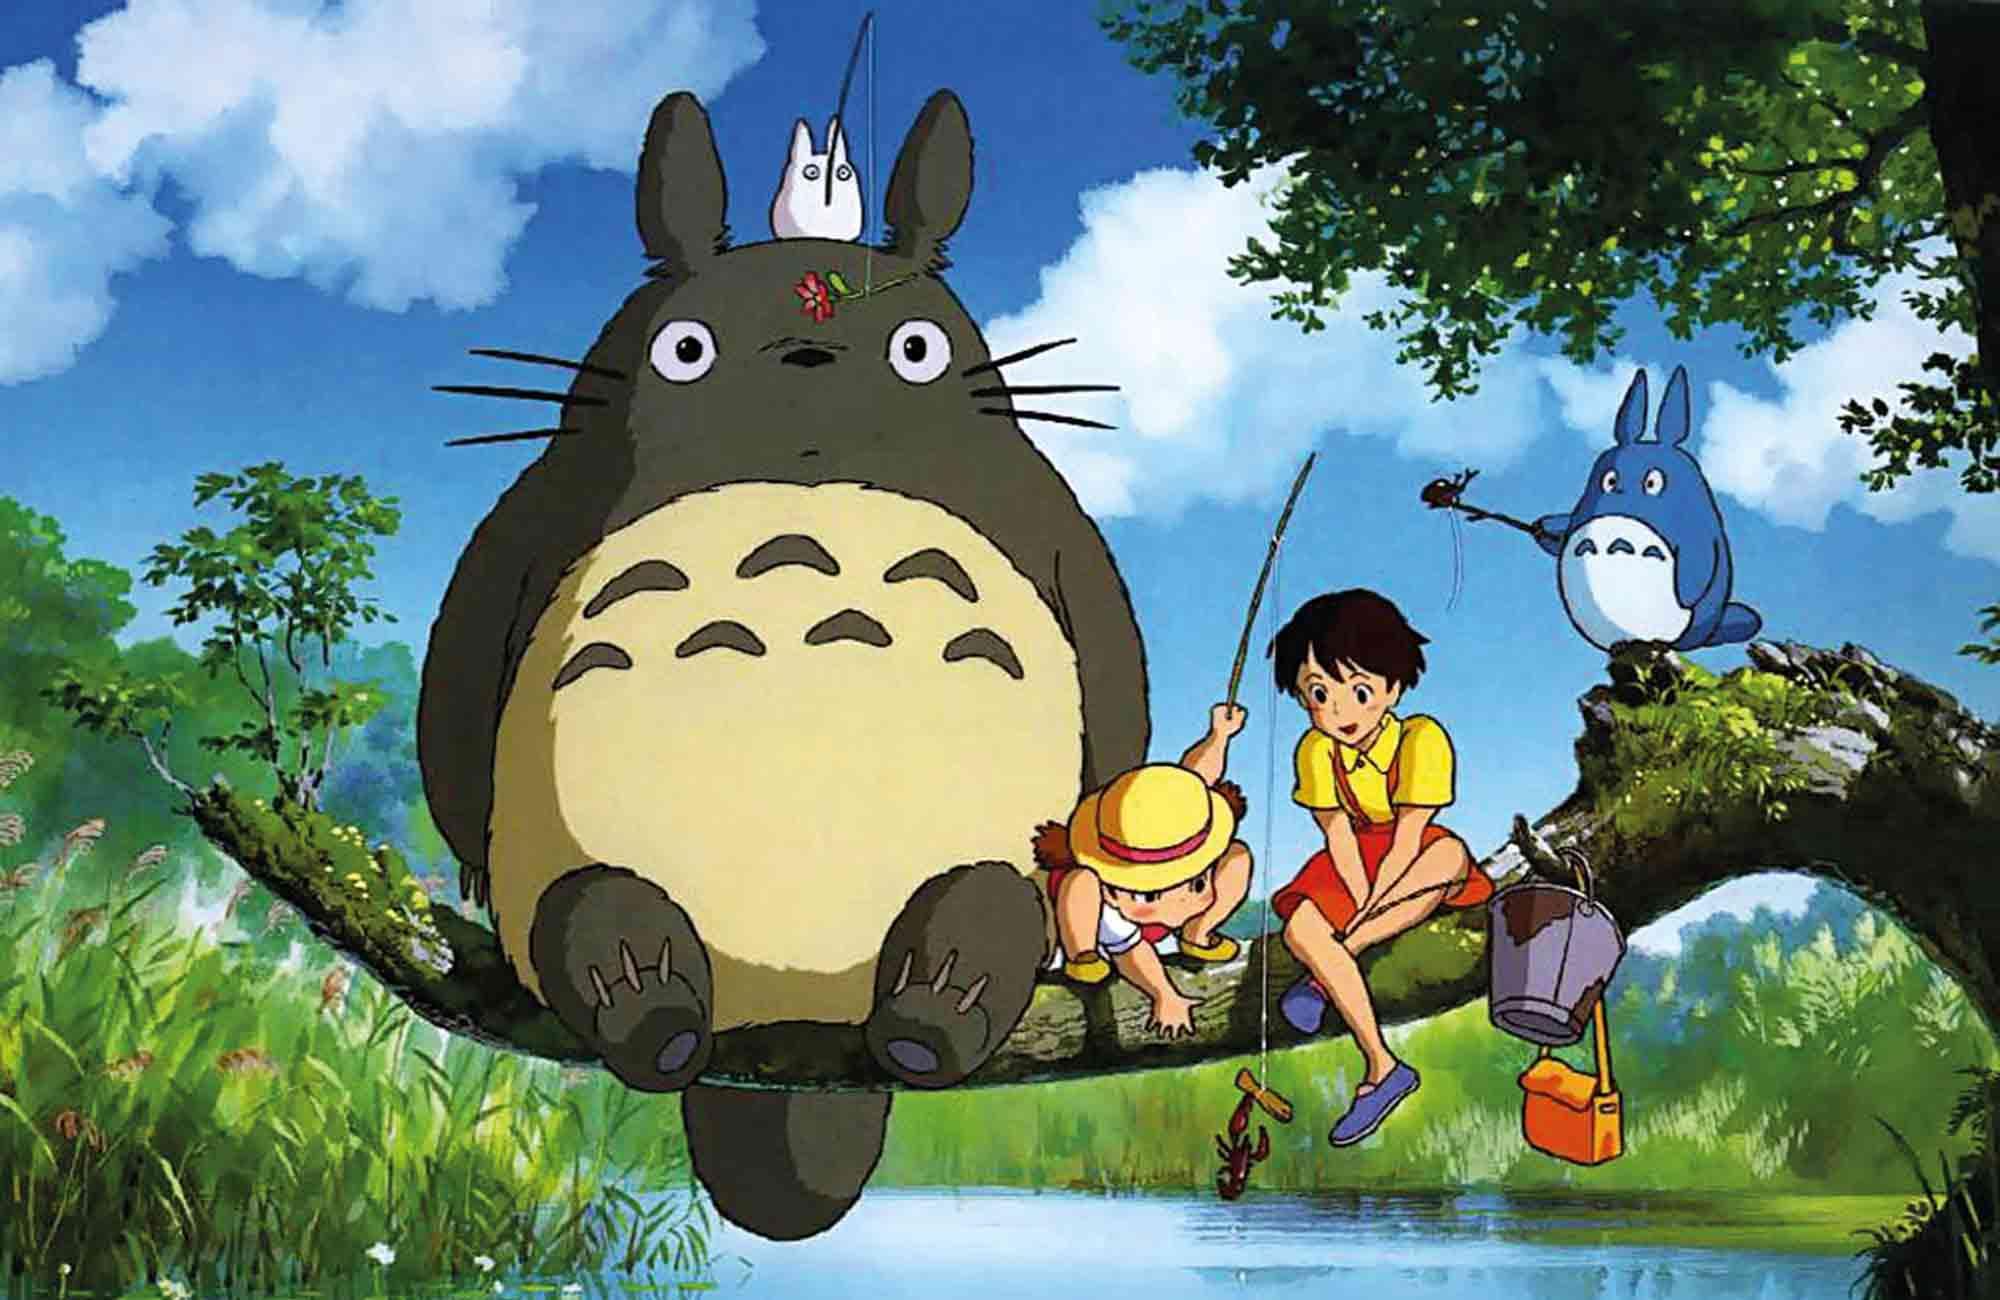 capture-mon-voisin-totoro-hayao-miyazaki-studio-ghibli-top-10-lieu-réel-amplitudes